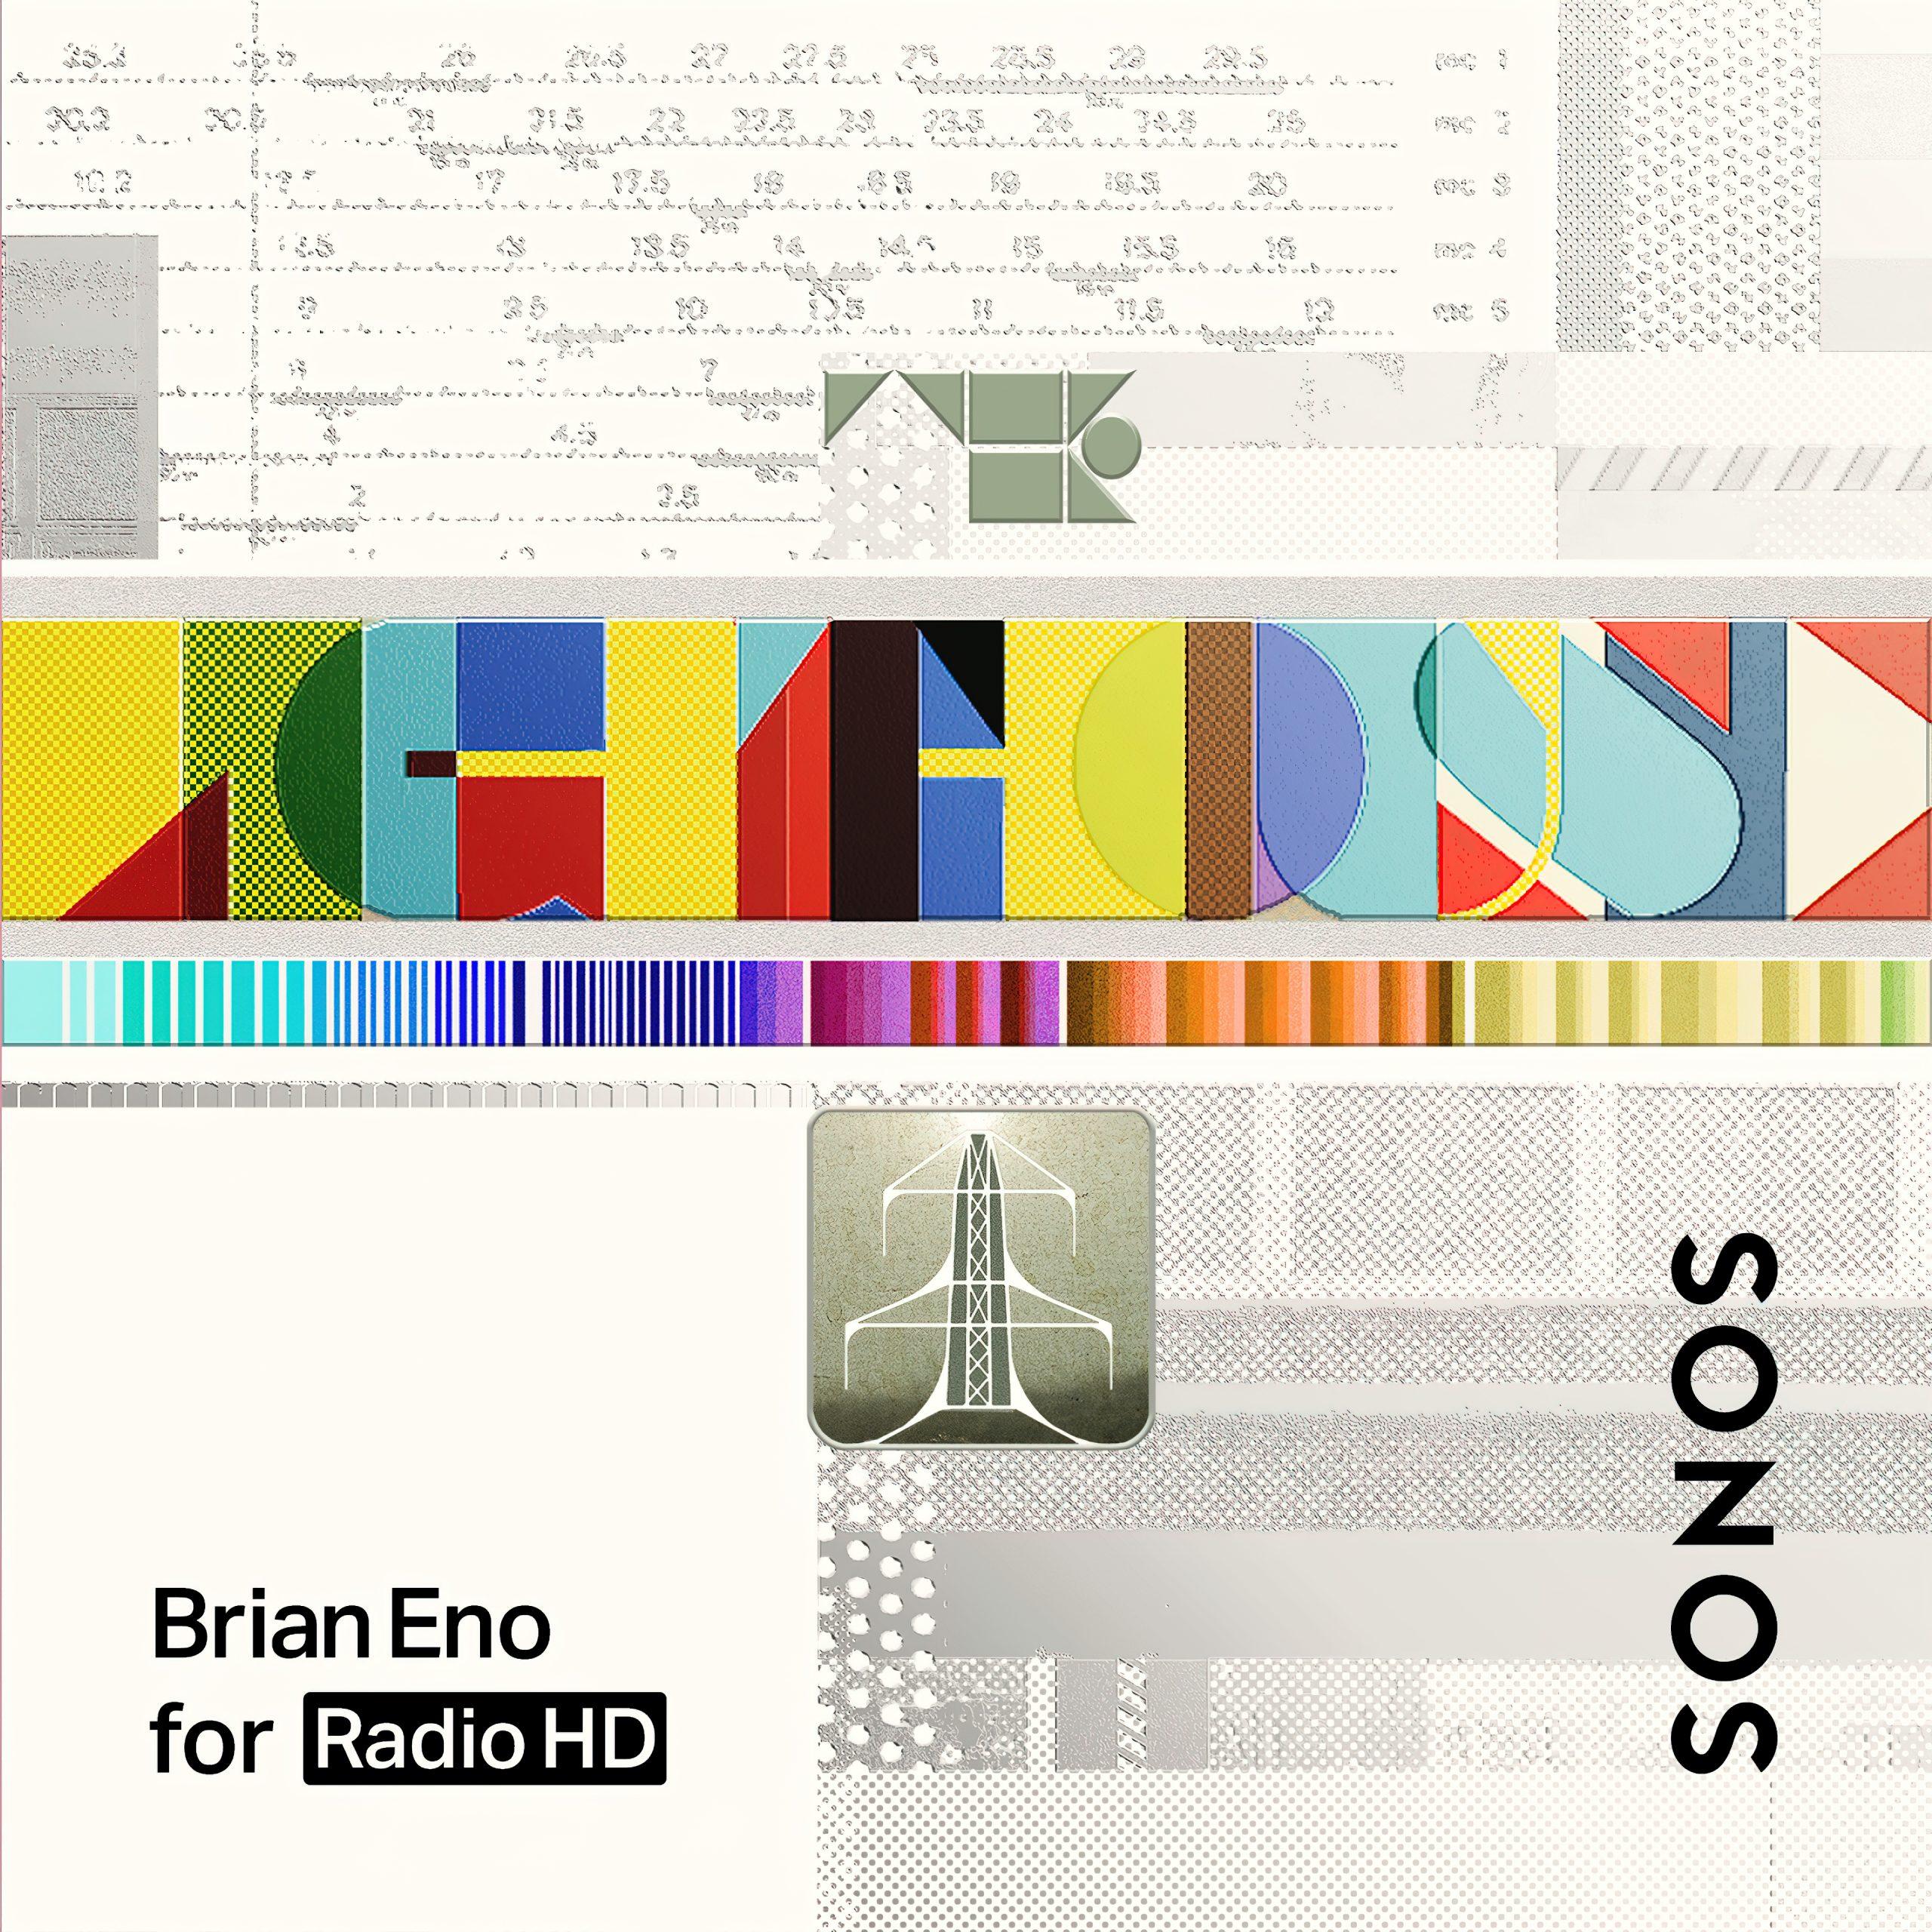 The Lighthouse Sonos Radio HD Brian Eno